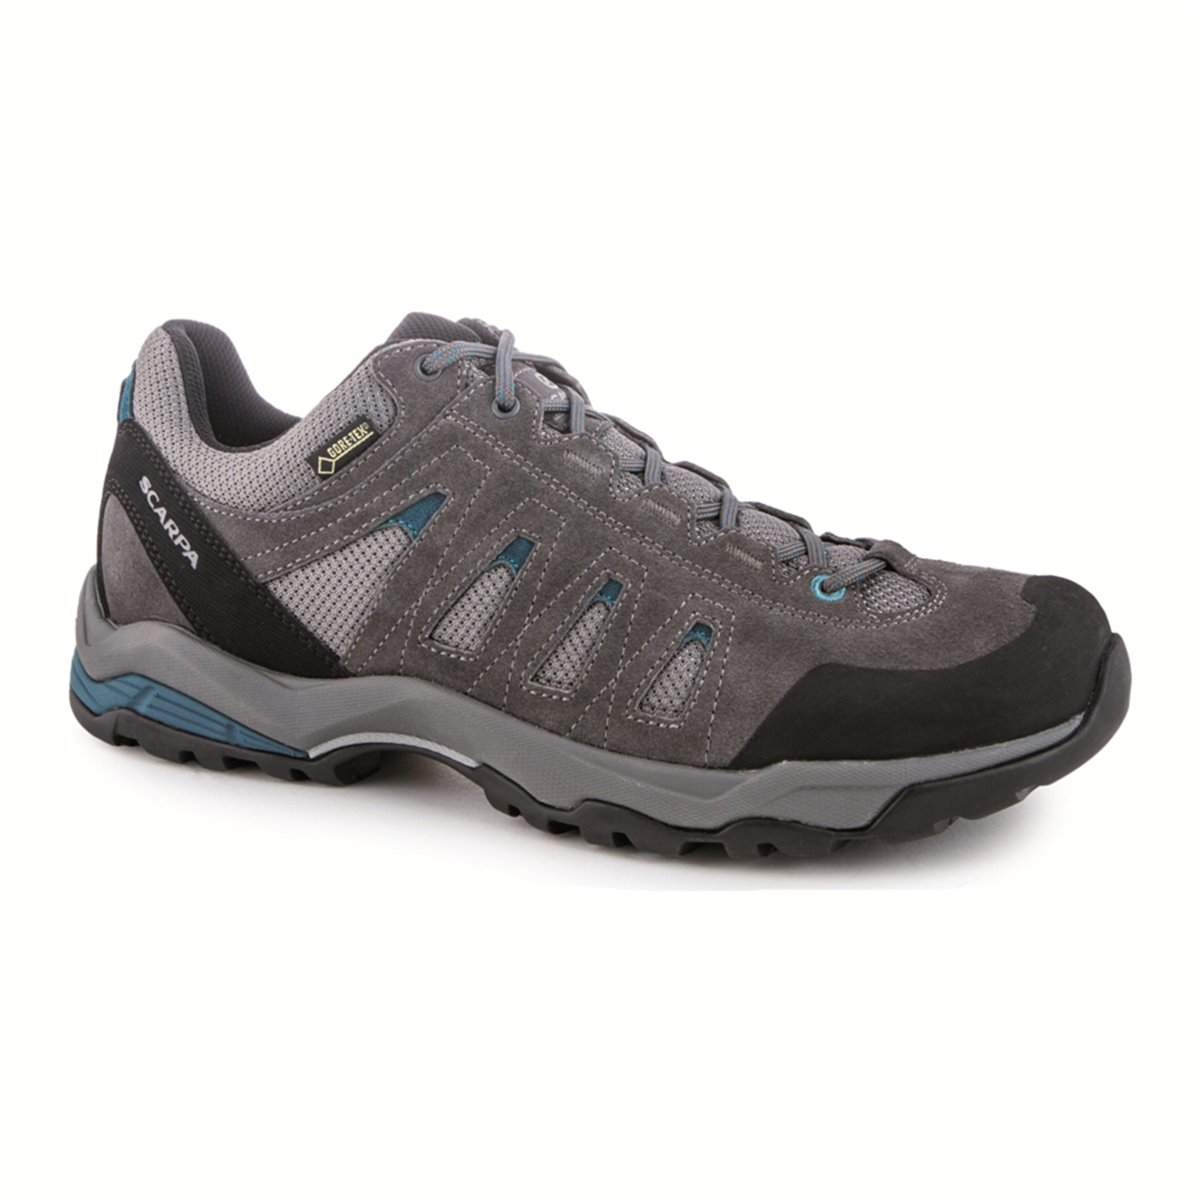 Trekking shoes Scarpa Moraine GTX